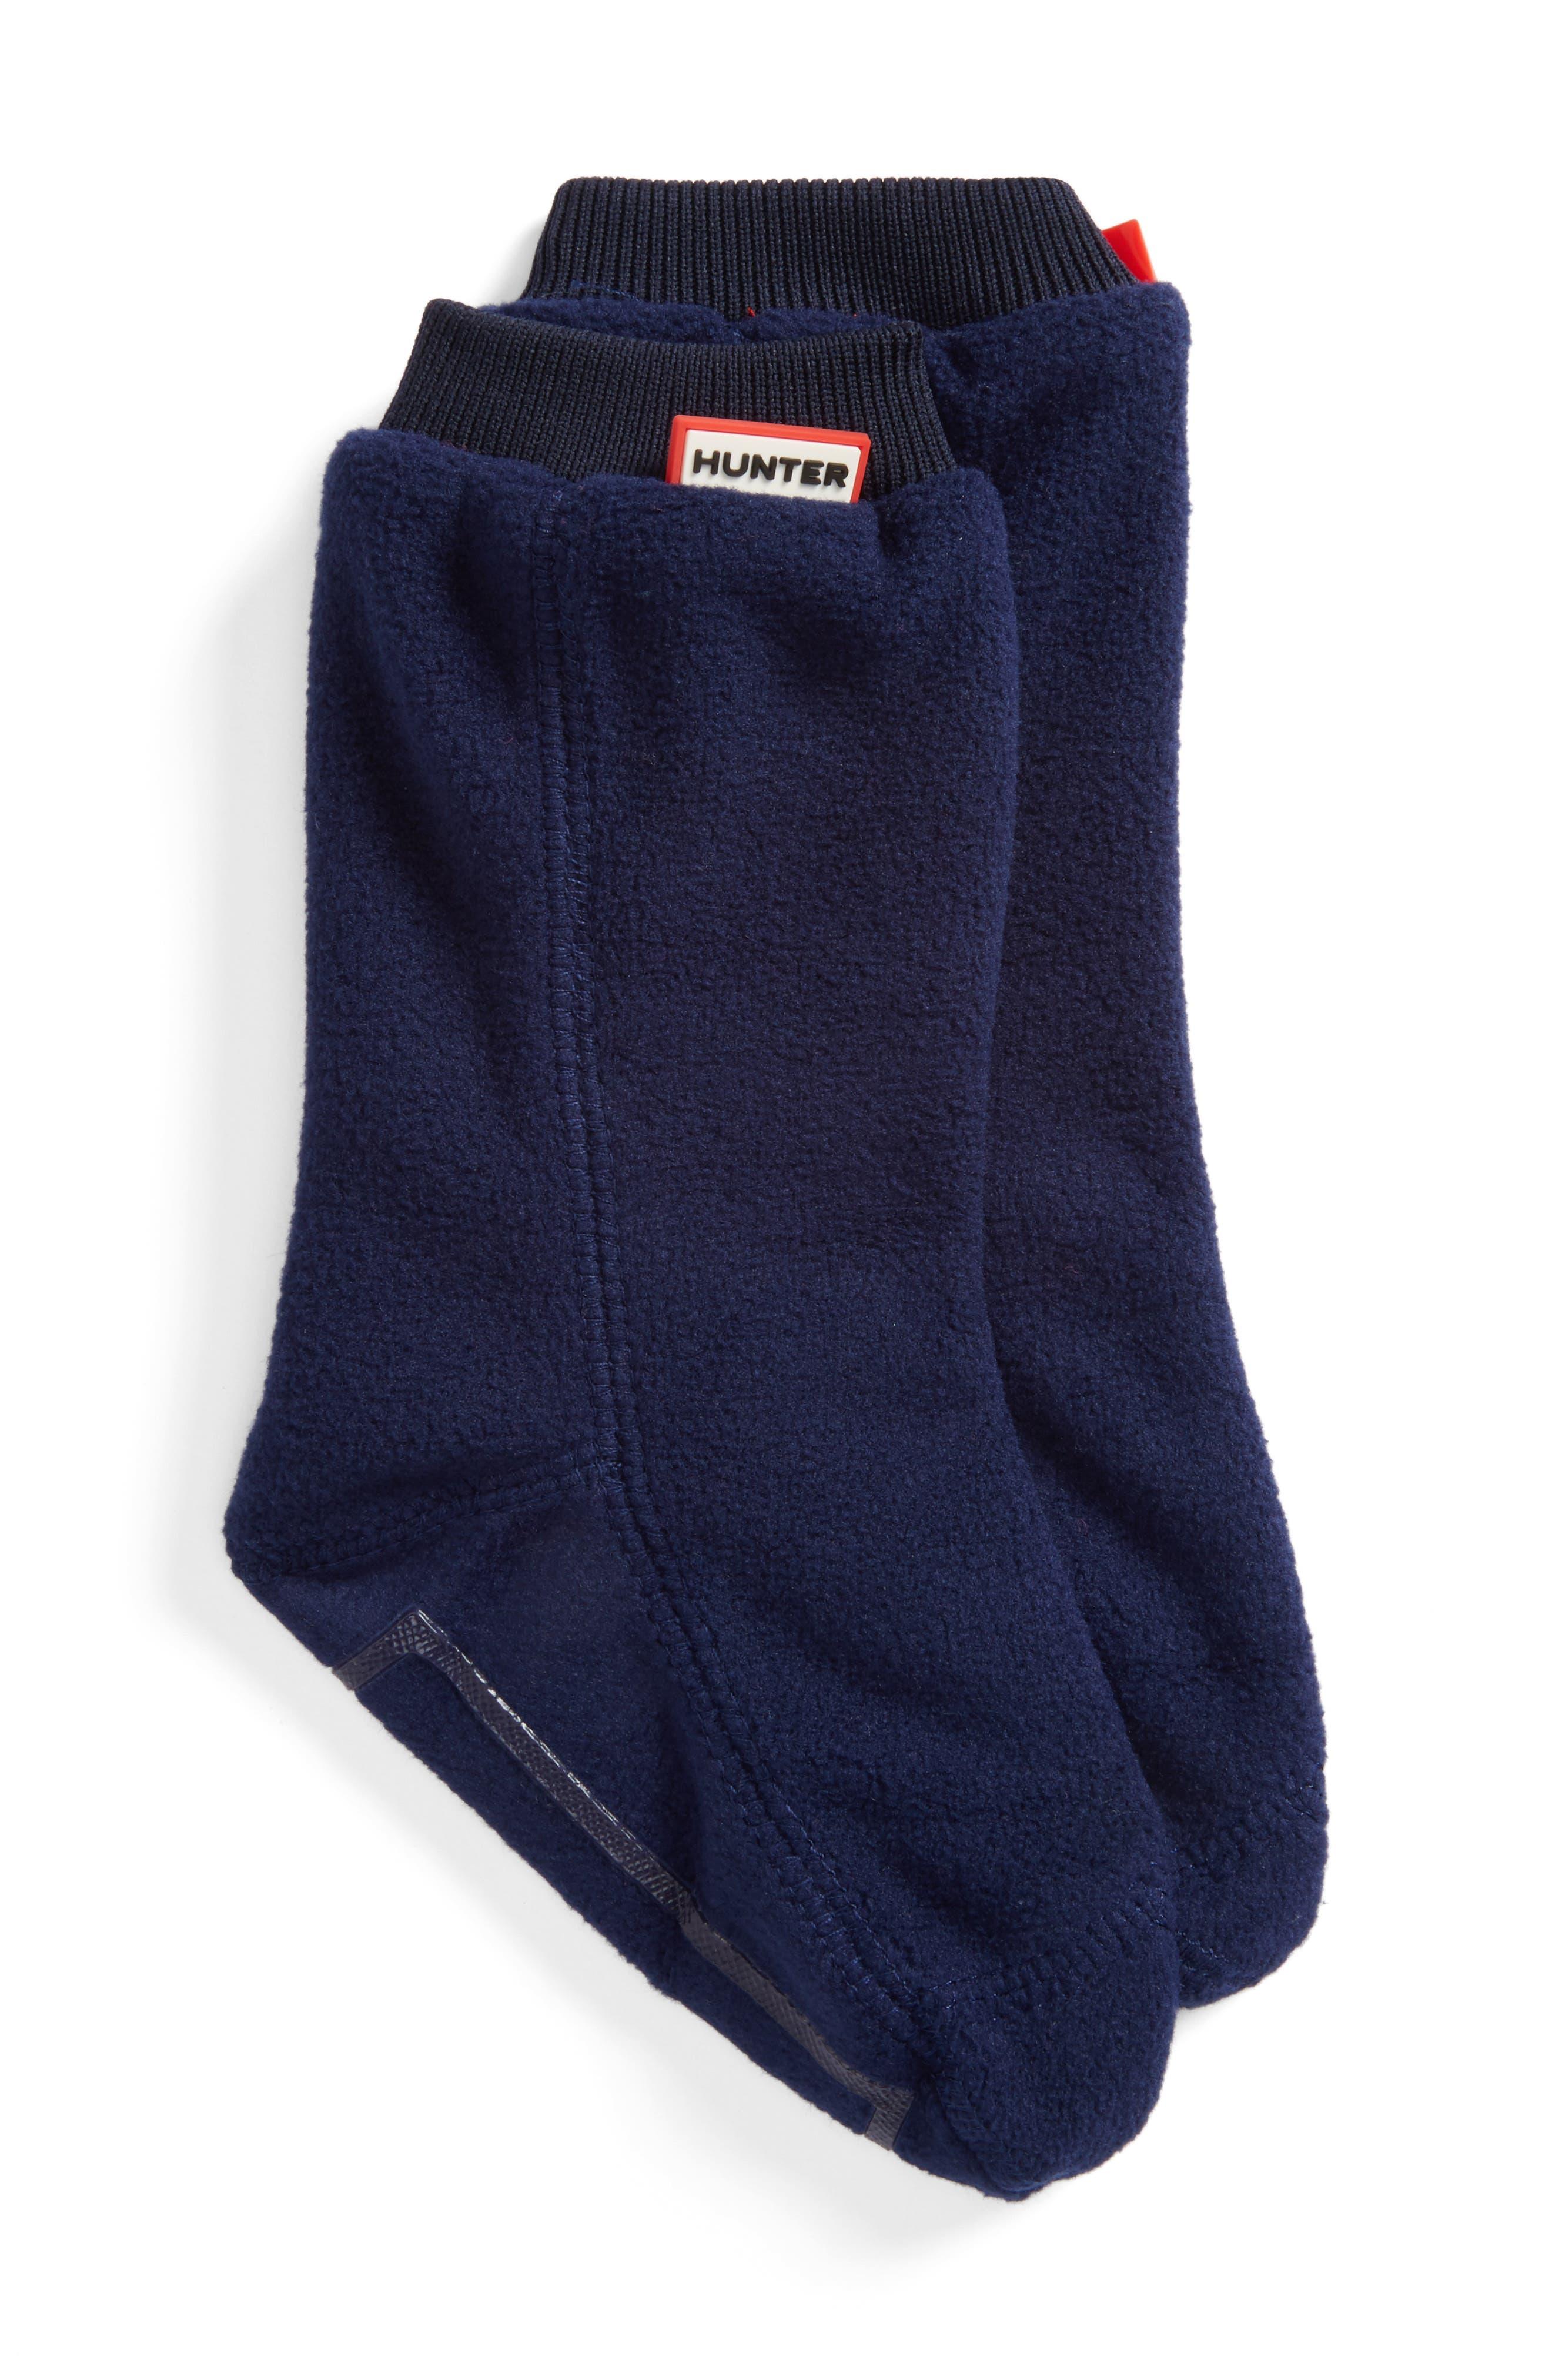 Original Fitted Boot Socks,                             Main thumbnail 1, color,                             Navy